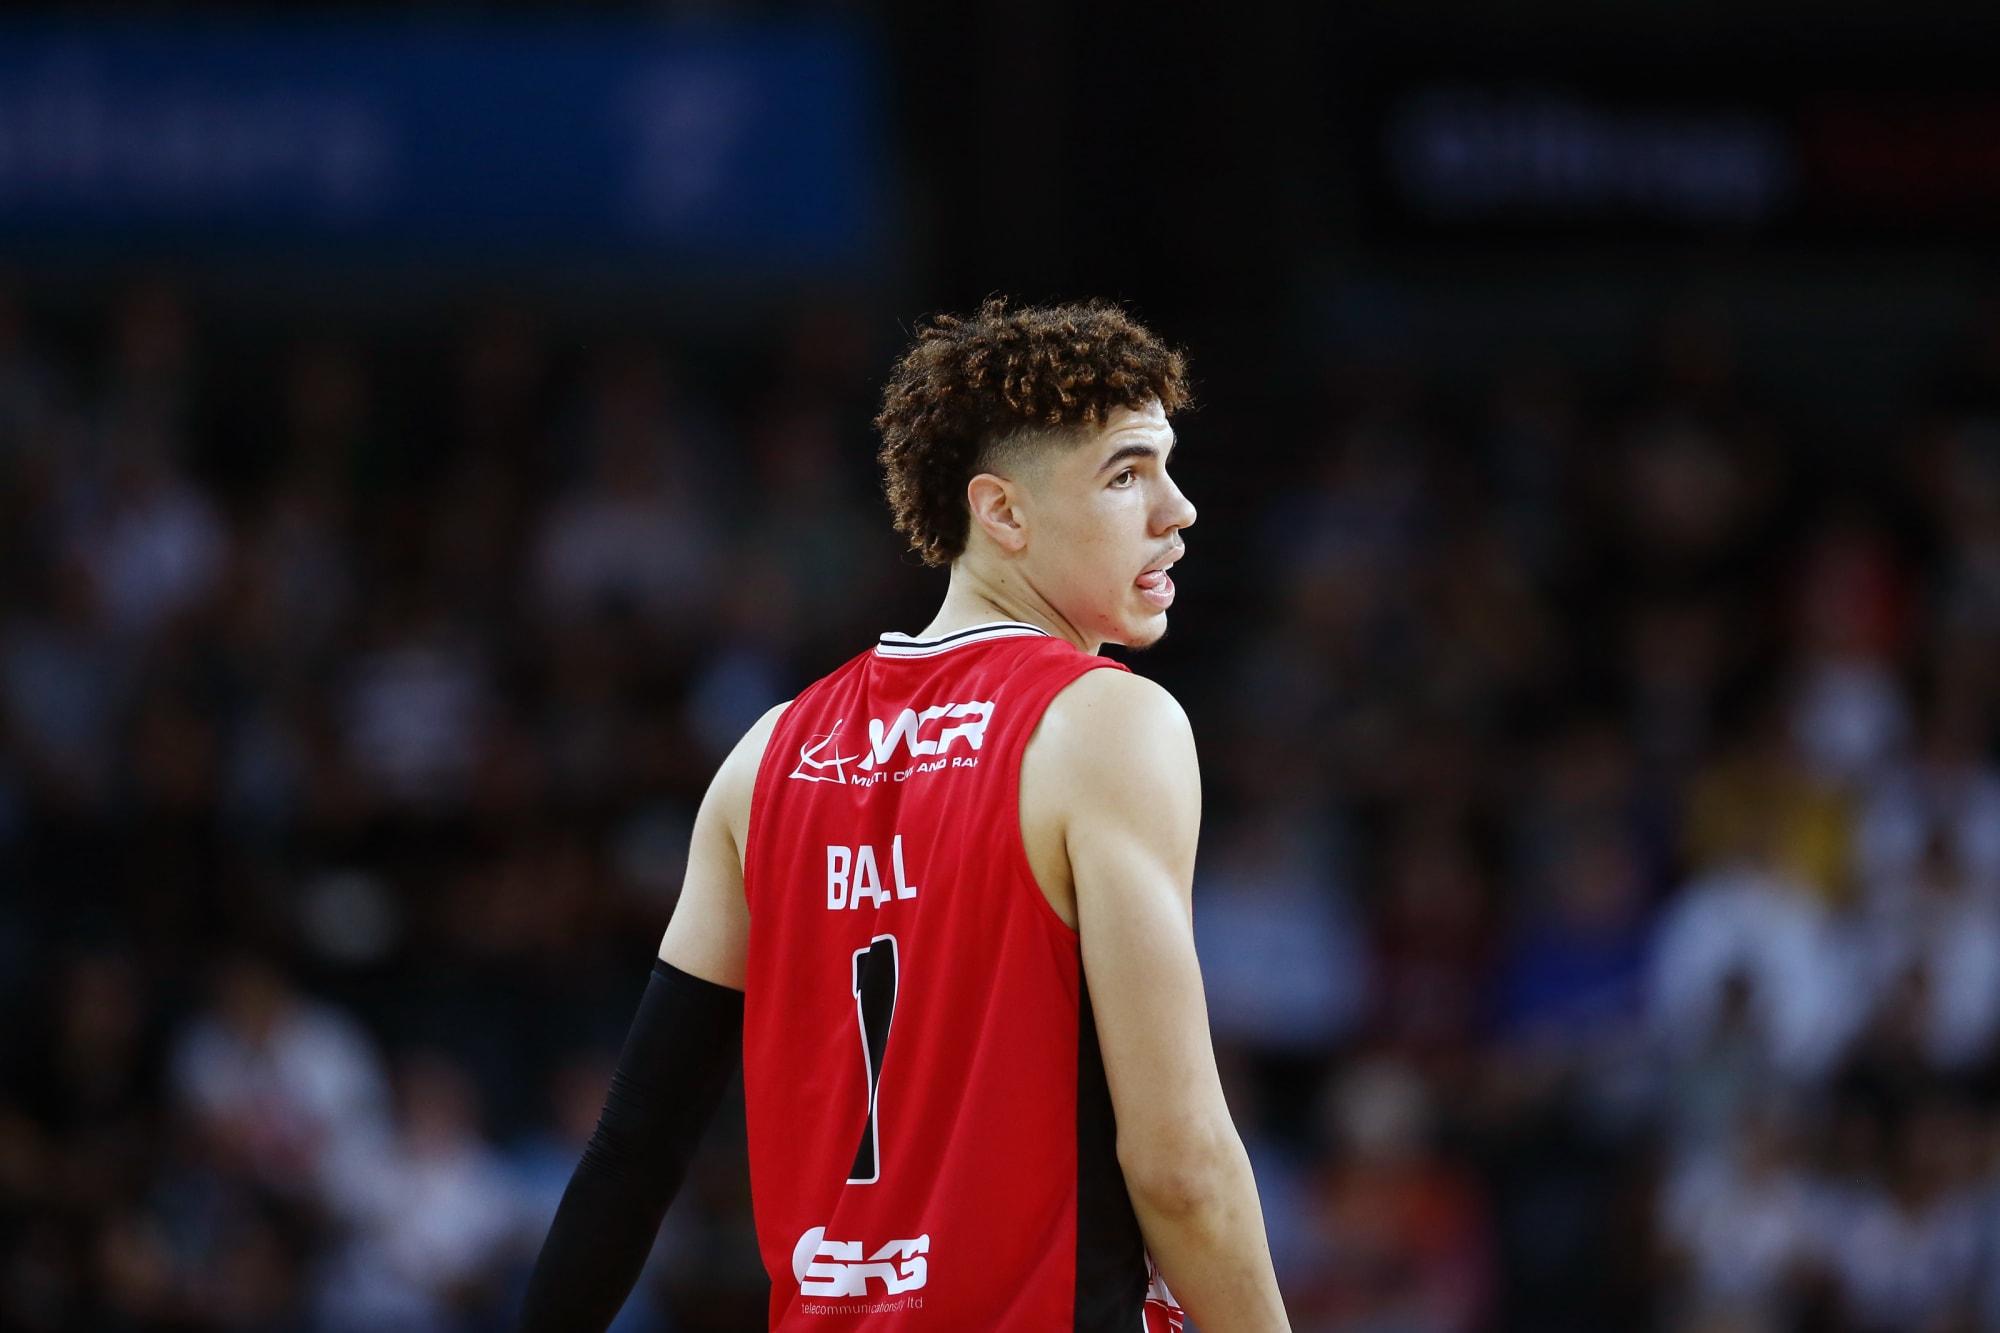 Toronto Raptors: must avoid drafting LaMelo Ball at 2020 NBA Draft